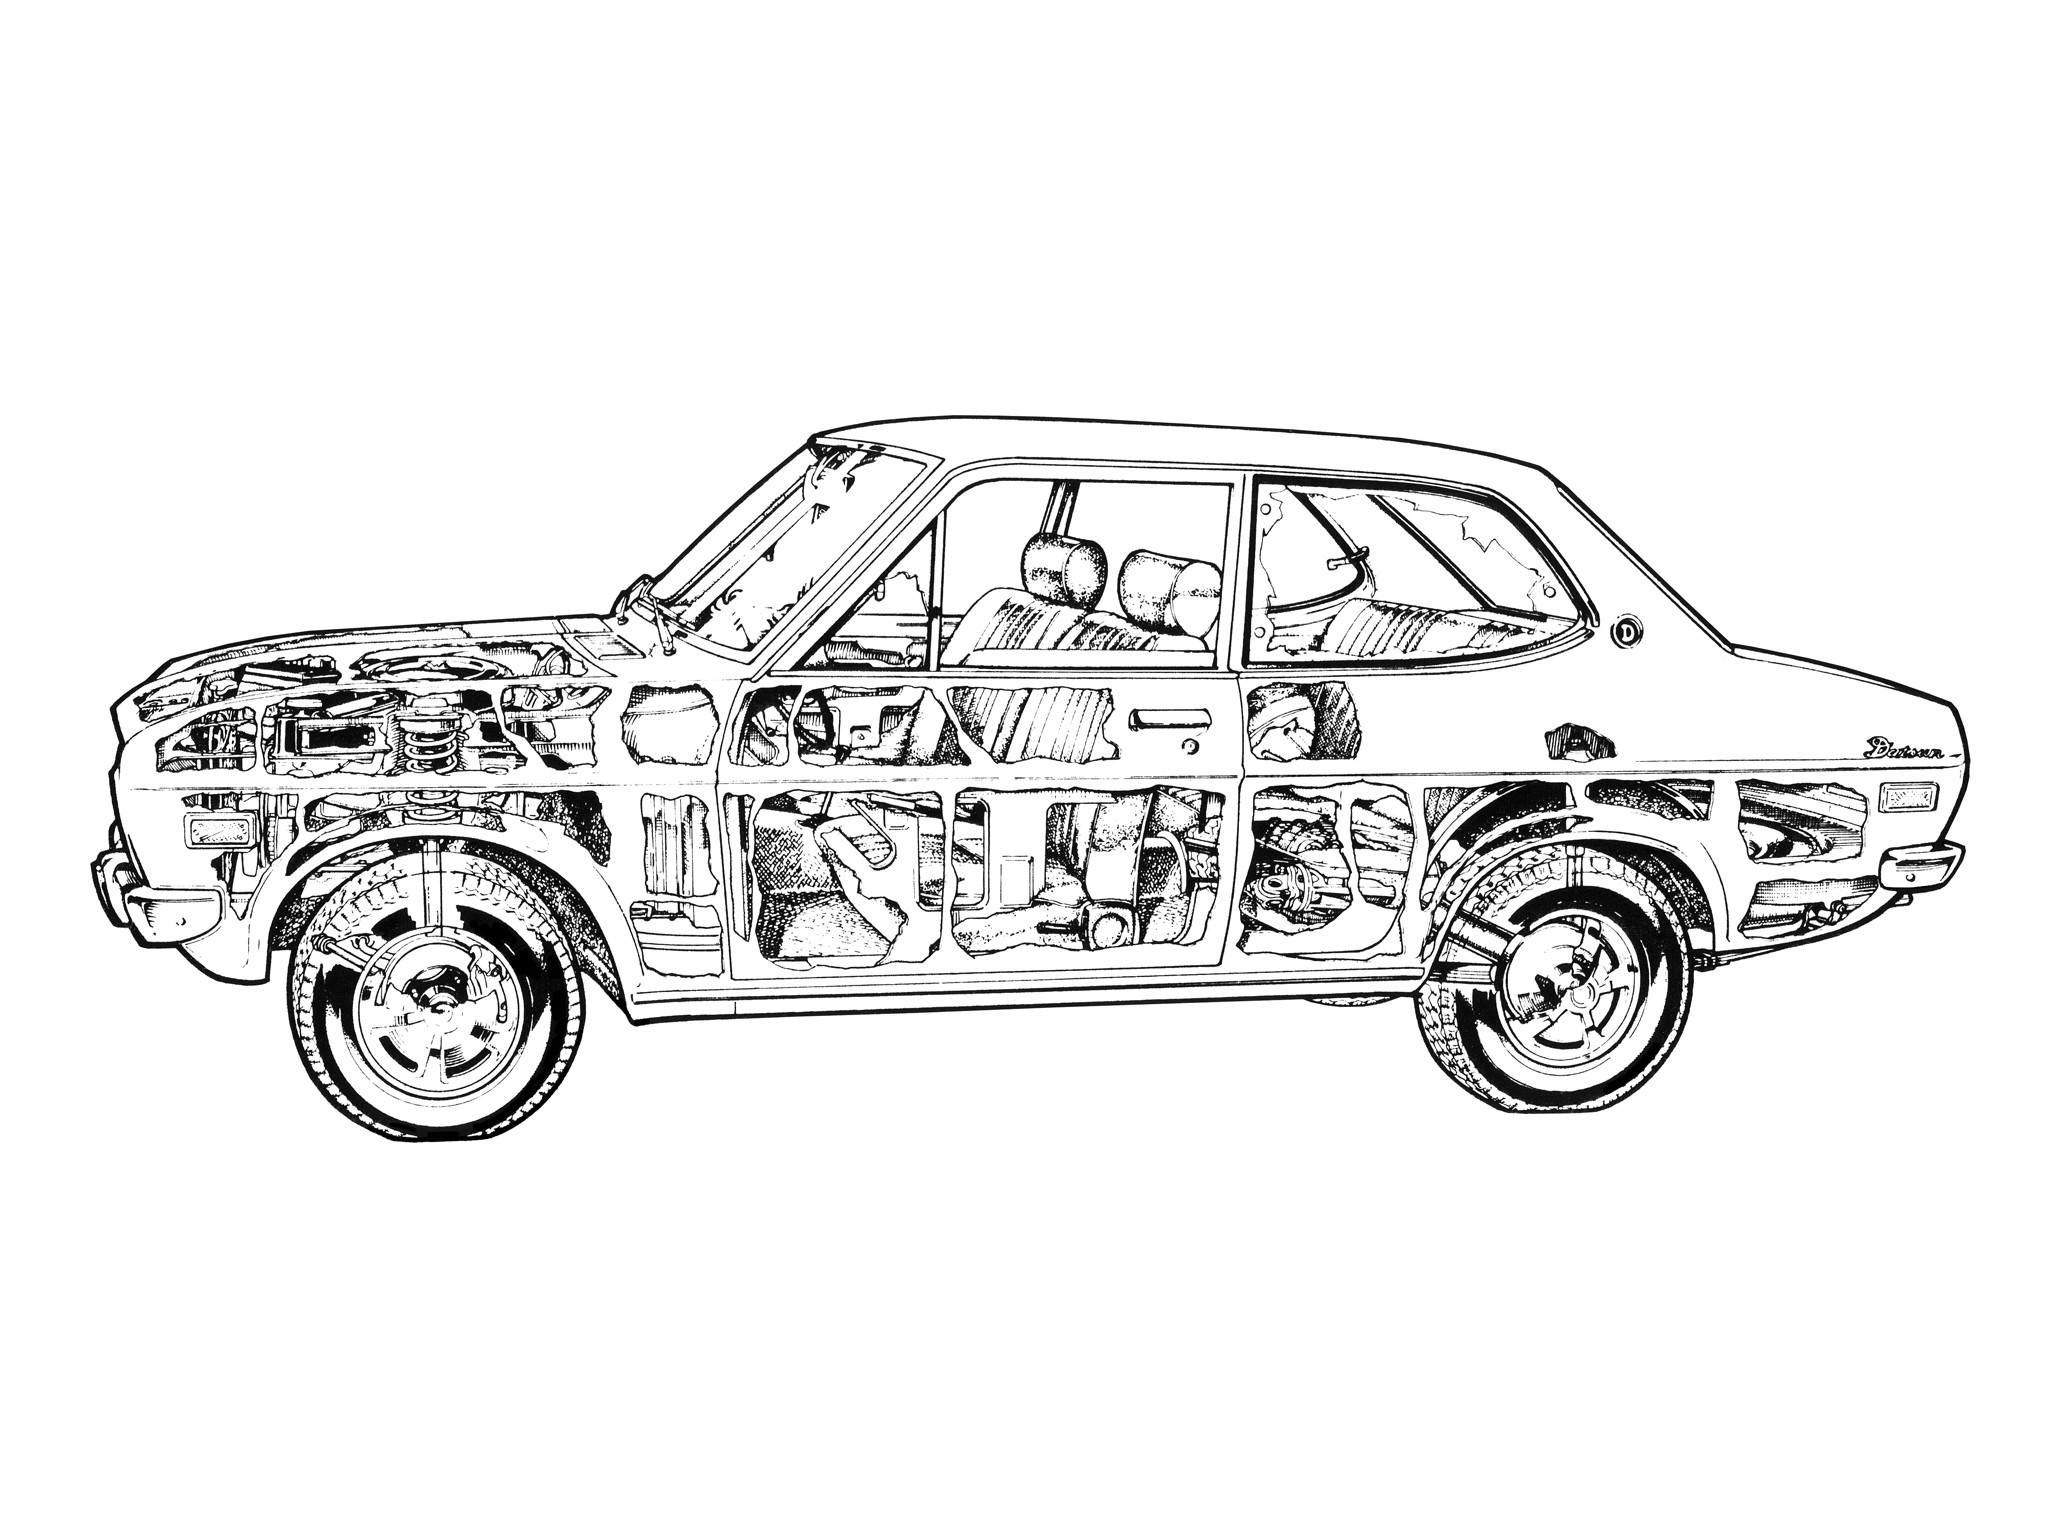 Fondos de pantalla : dibujo, vehículo, arte lineal